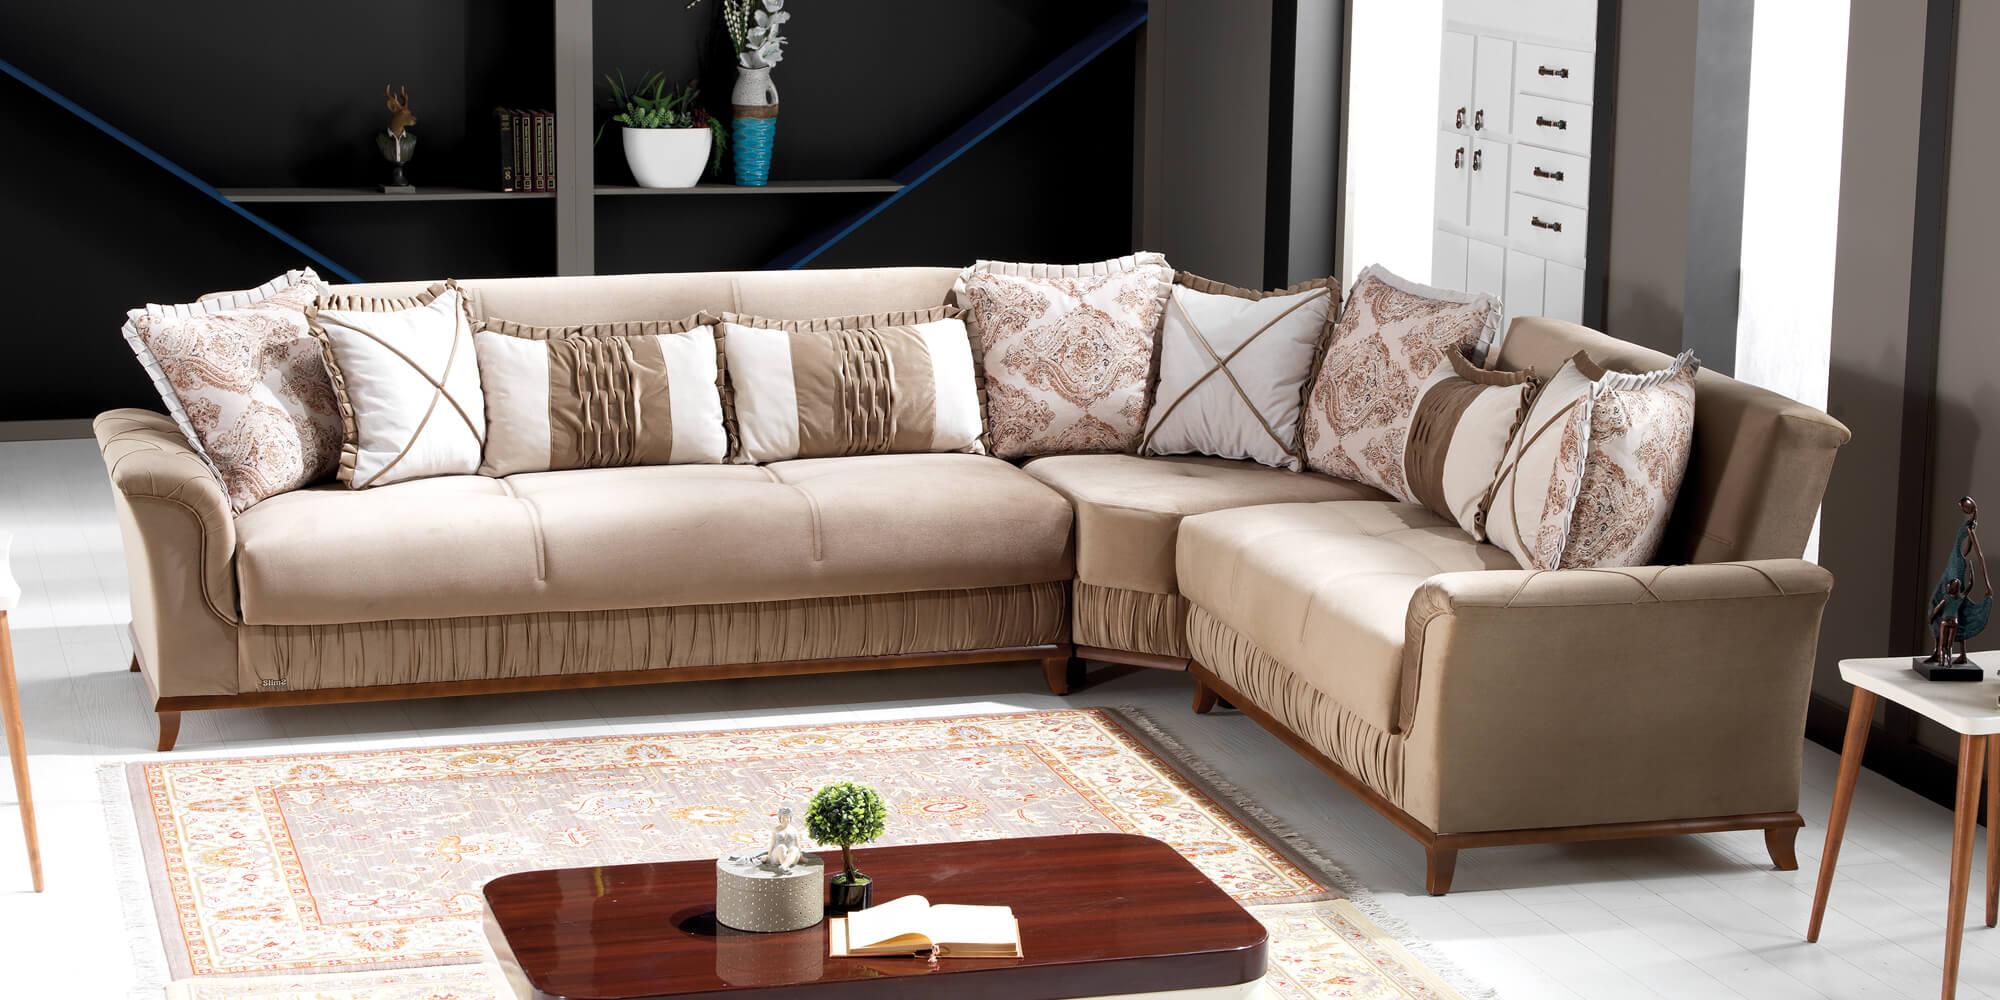 kristal sitzecke yuvam m belhaus in wuppertal cilek offizieller h ndler in europa. Black Bedroom Furniture Sets. Home Design Ideas